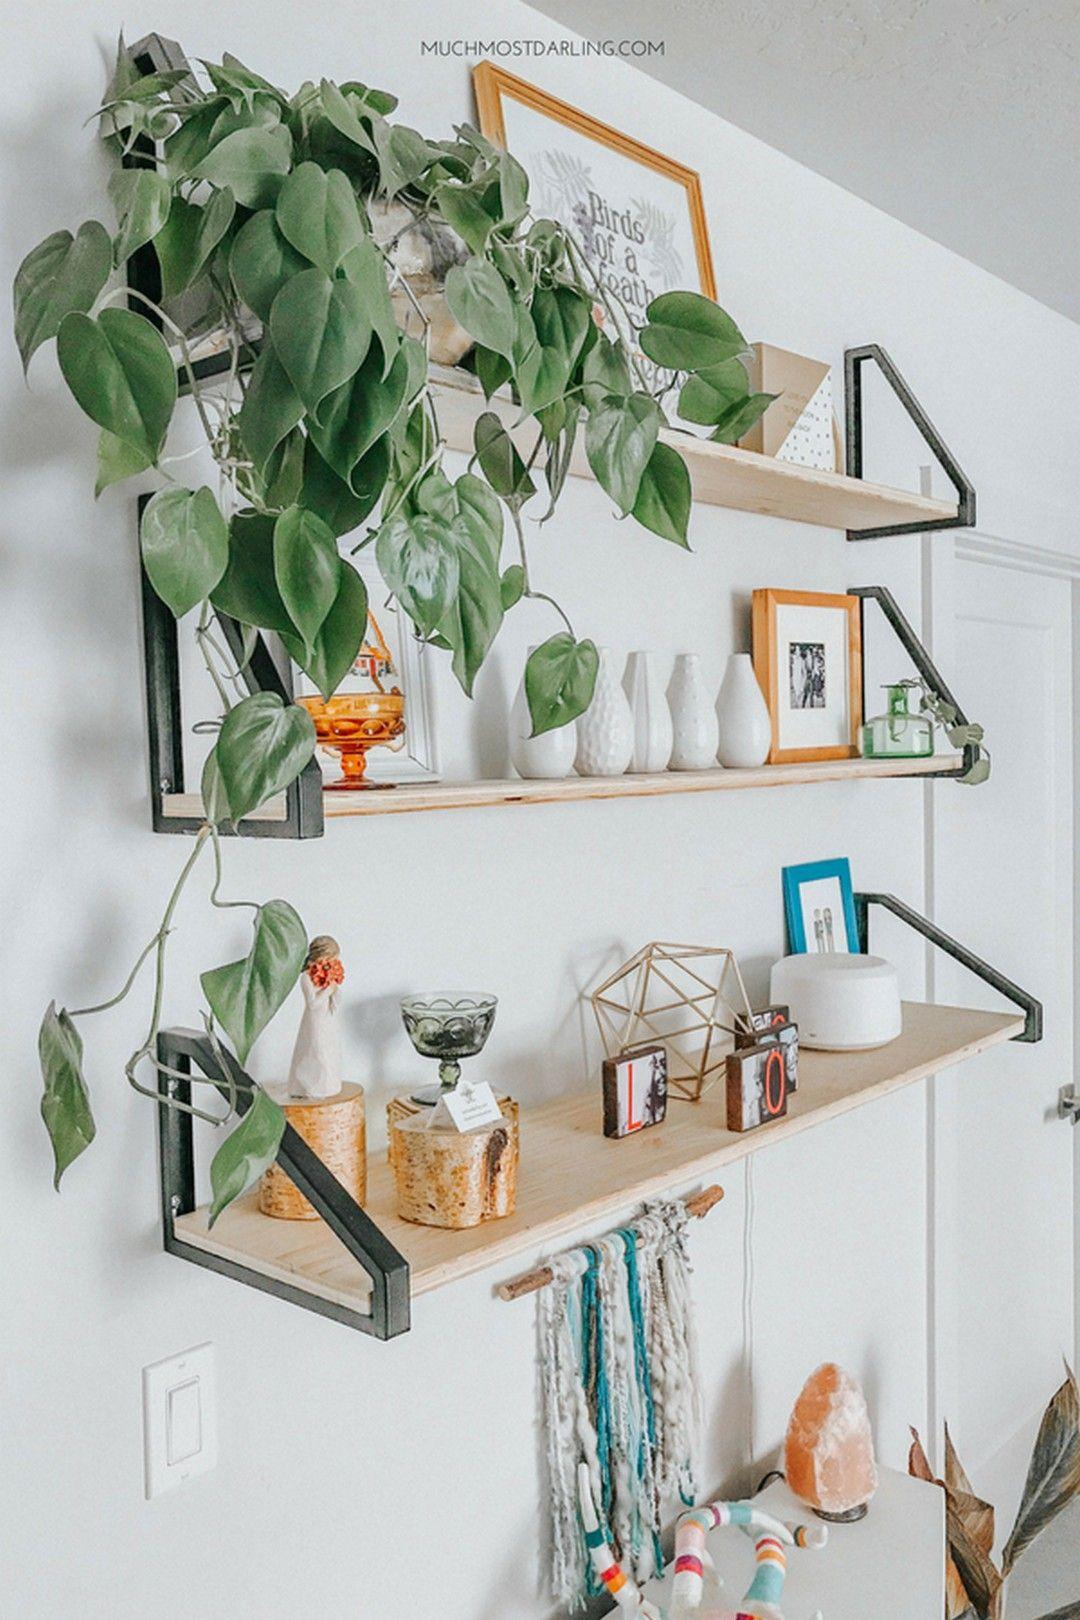 24+ Impressive DIY Shelves For Storage & Style Decor